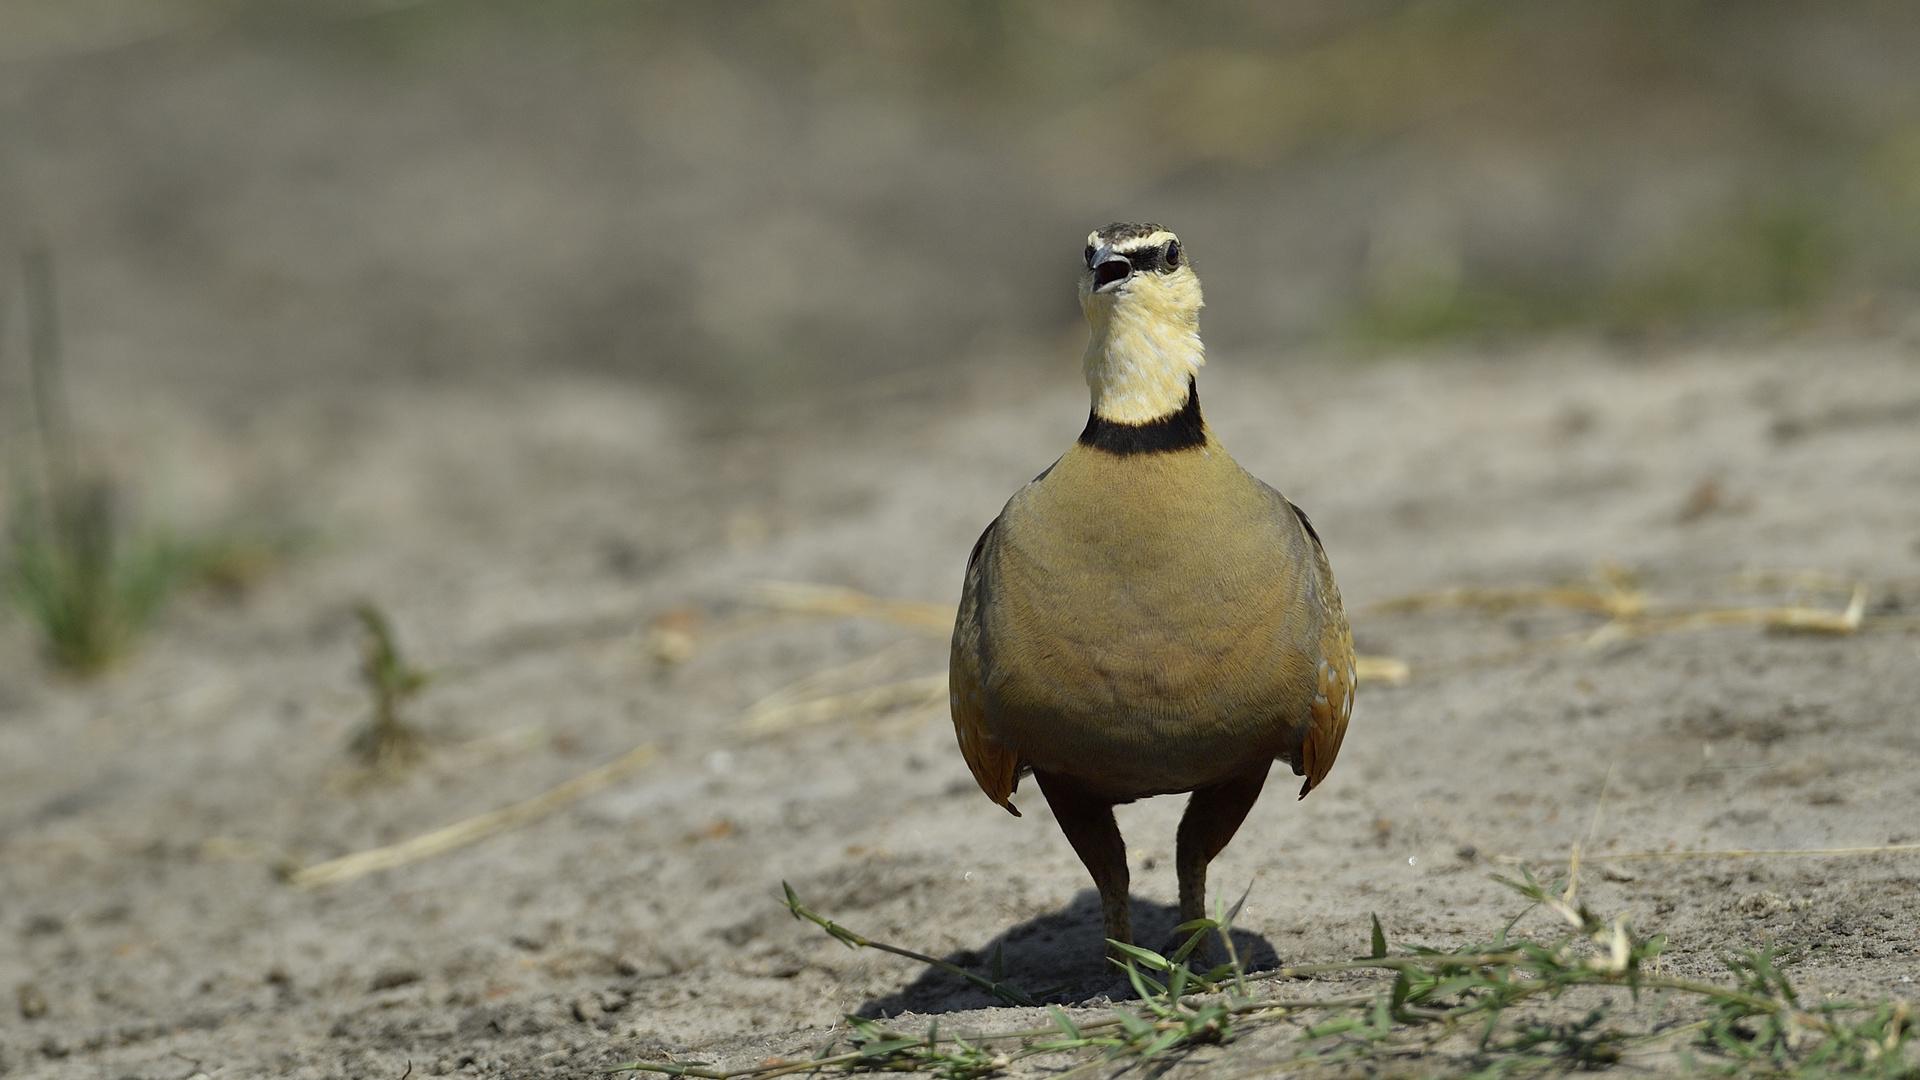 Yellow-throated Sandgrouse